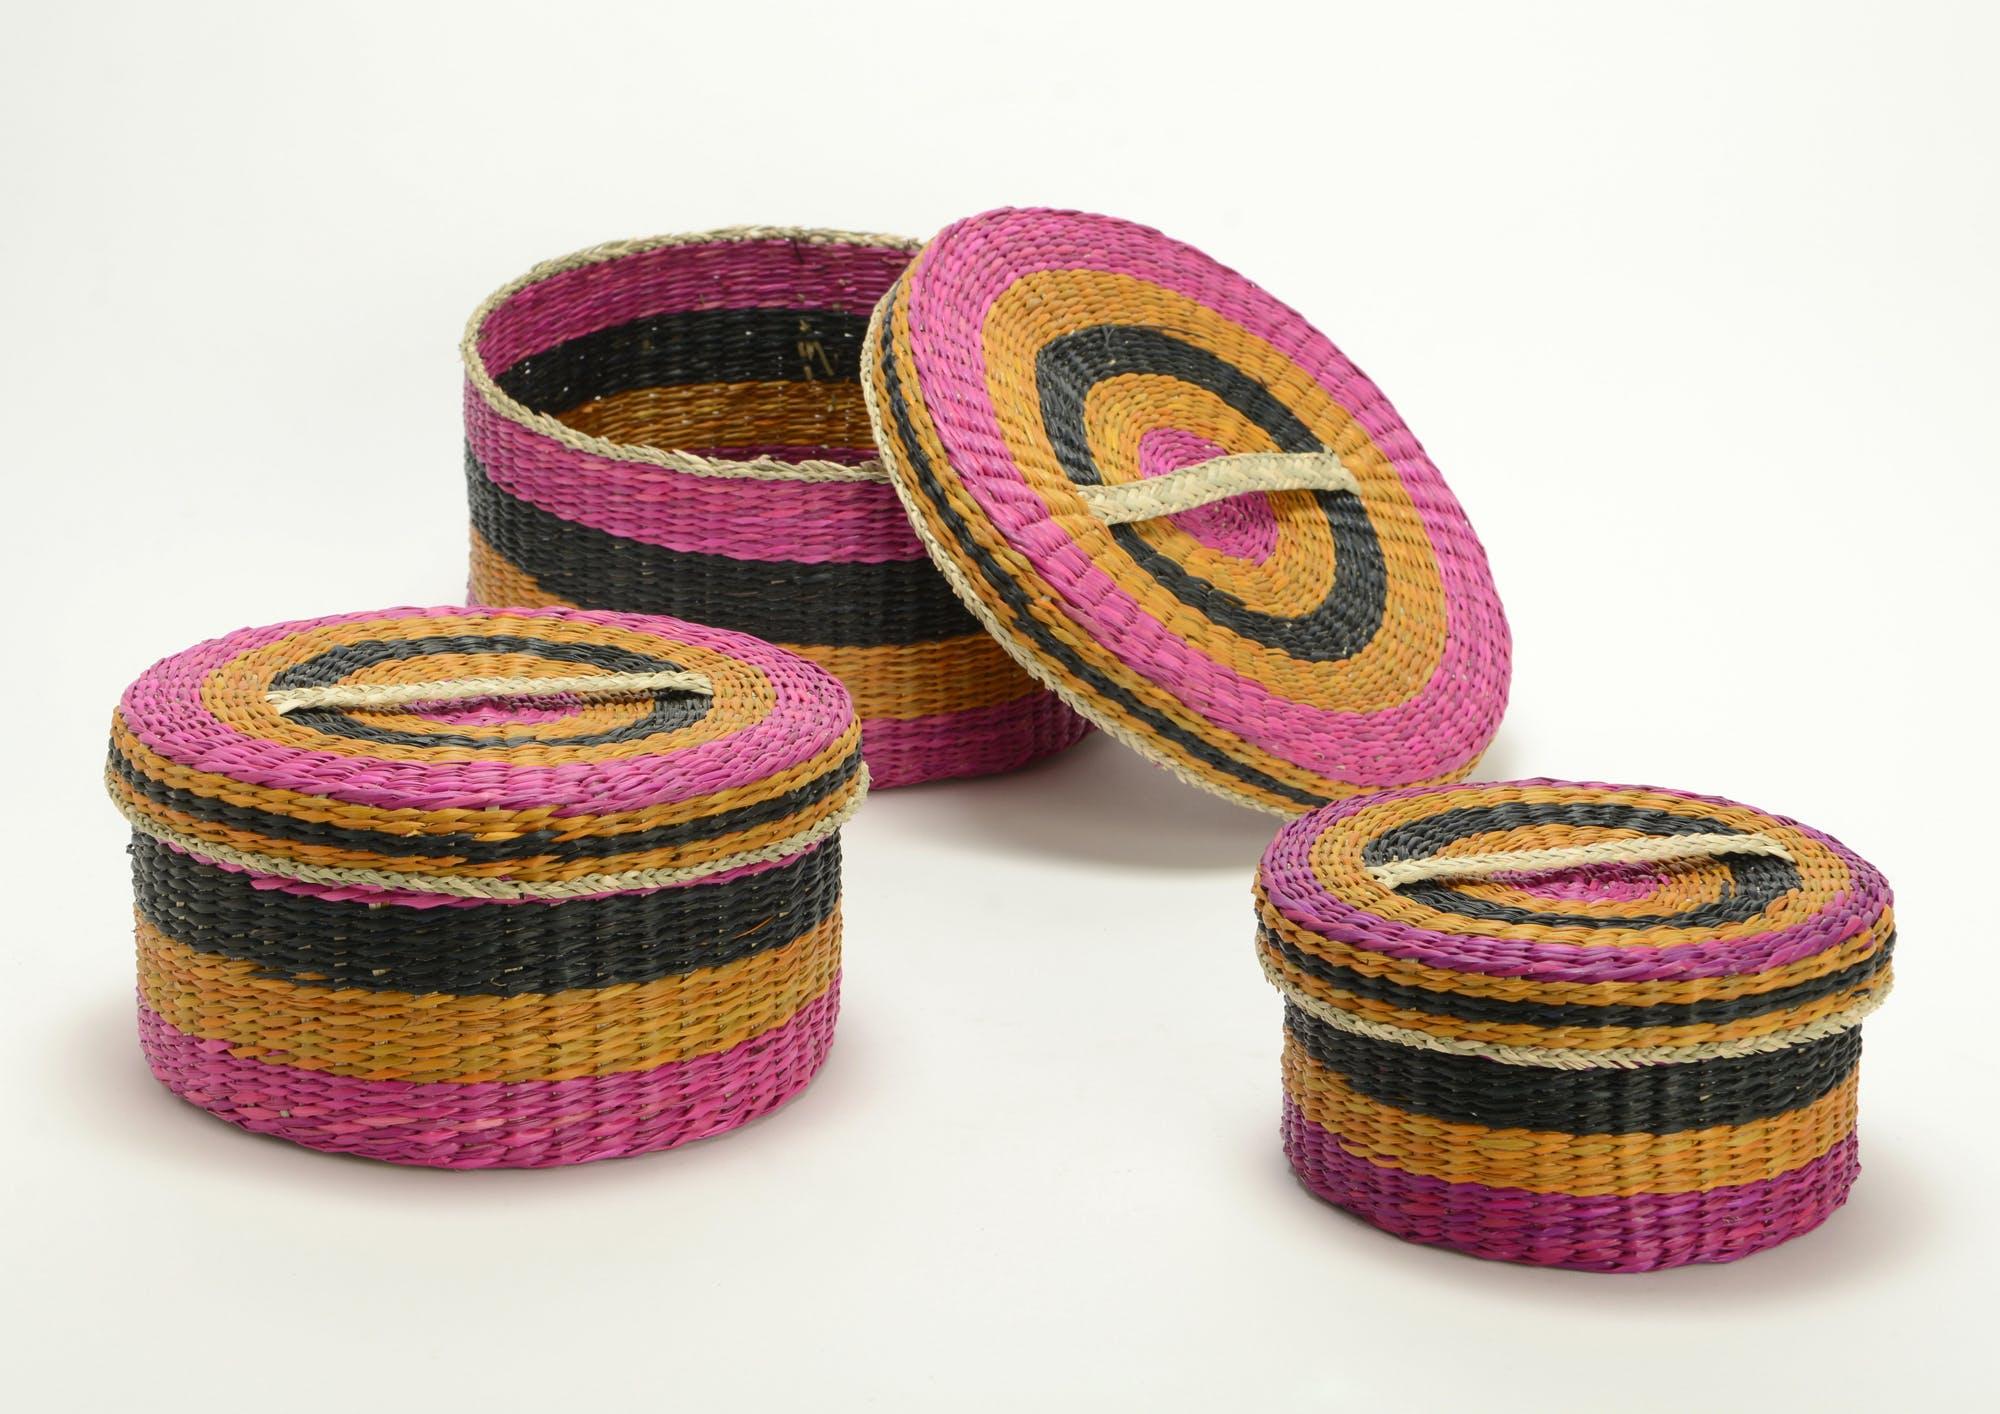 Boite ronde fibre colorée dominante fuschia grand modèle